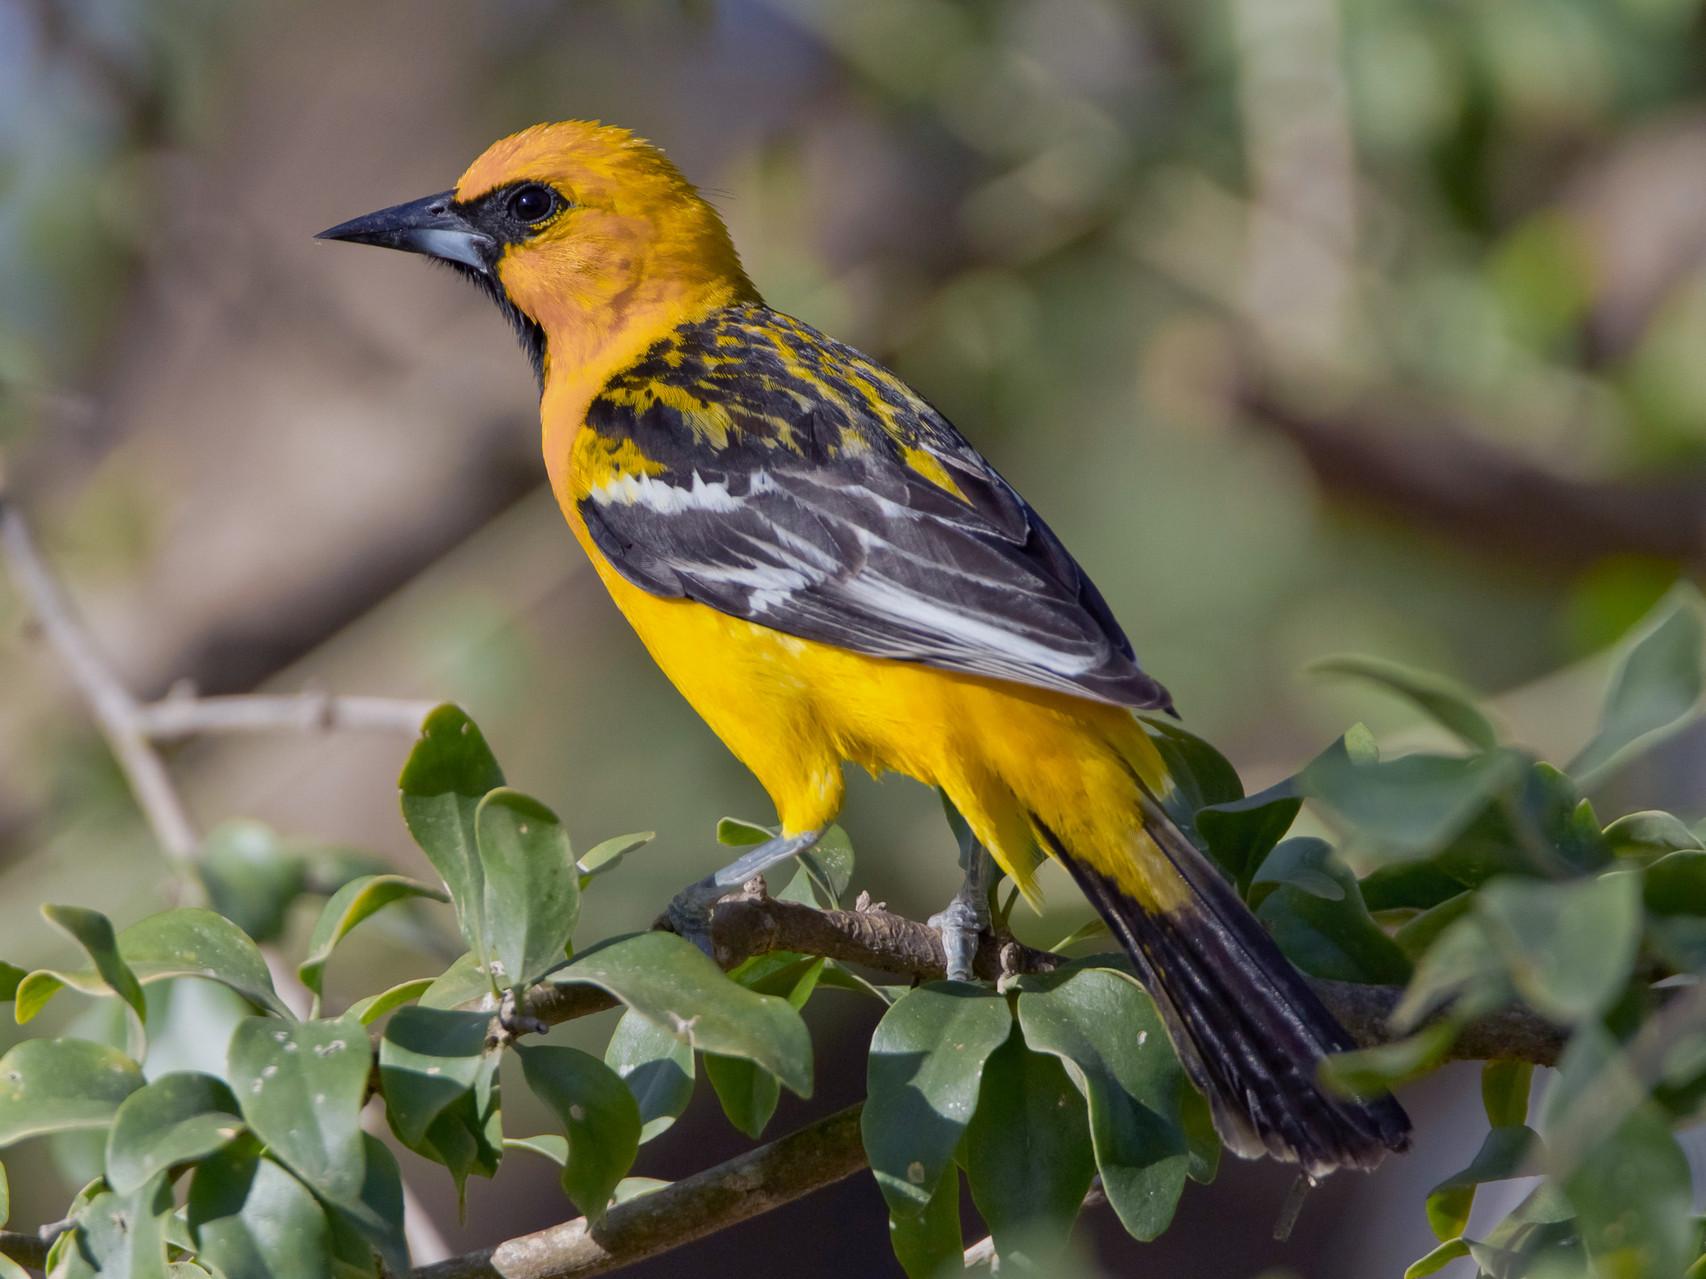 Piroltrupial, Tamarindo, Costa Rica